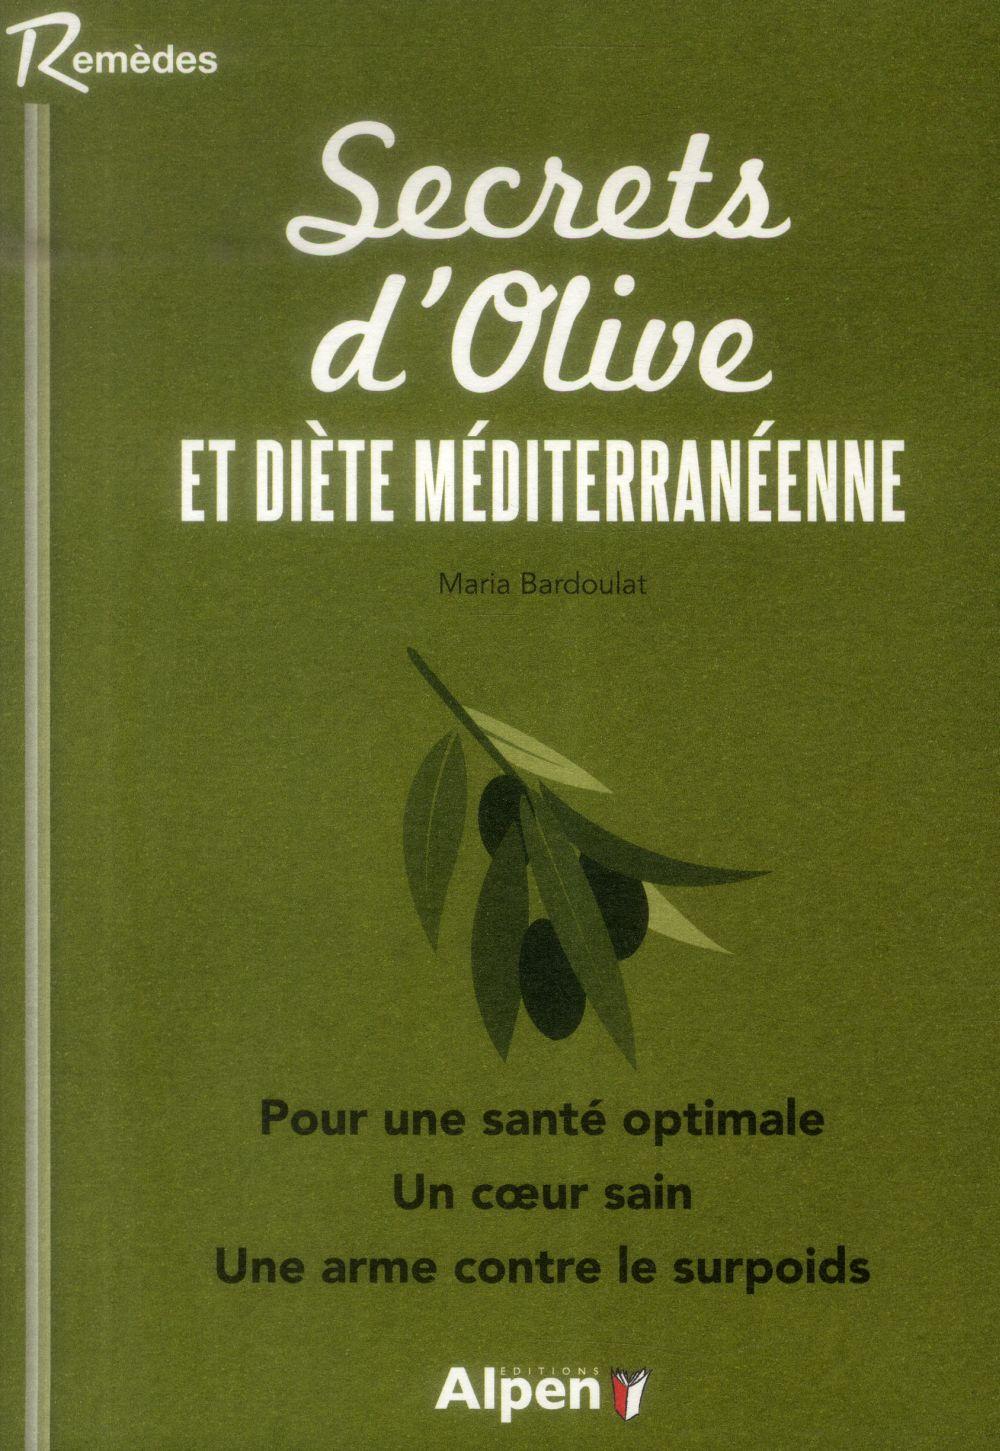 SECRETS D'OLIVE ET DIETE MEDITERRANEENNE